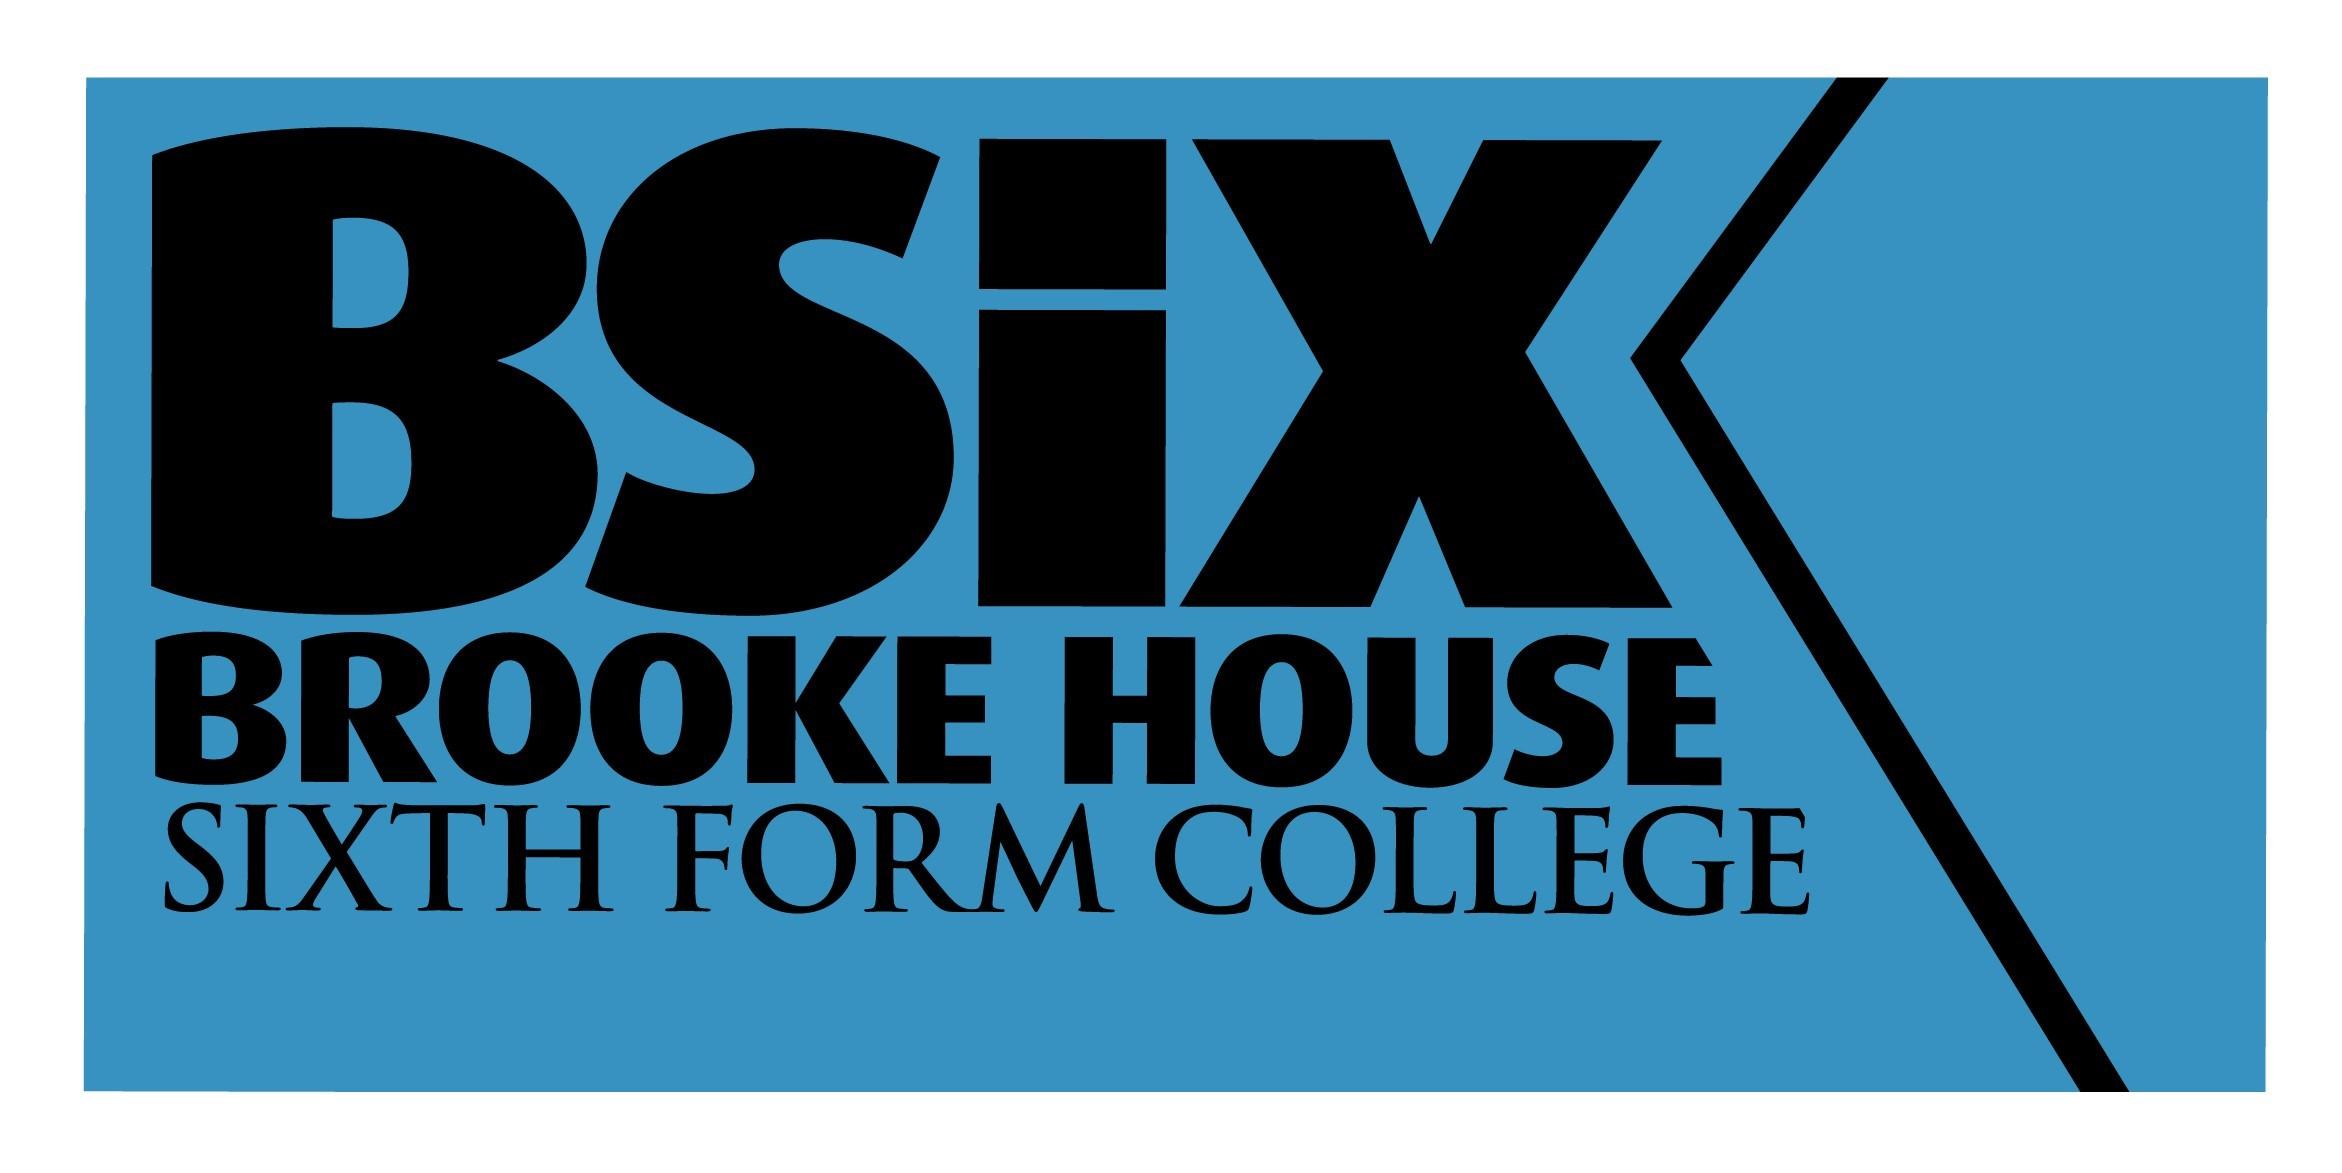 BSix Sixth Form College